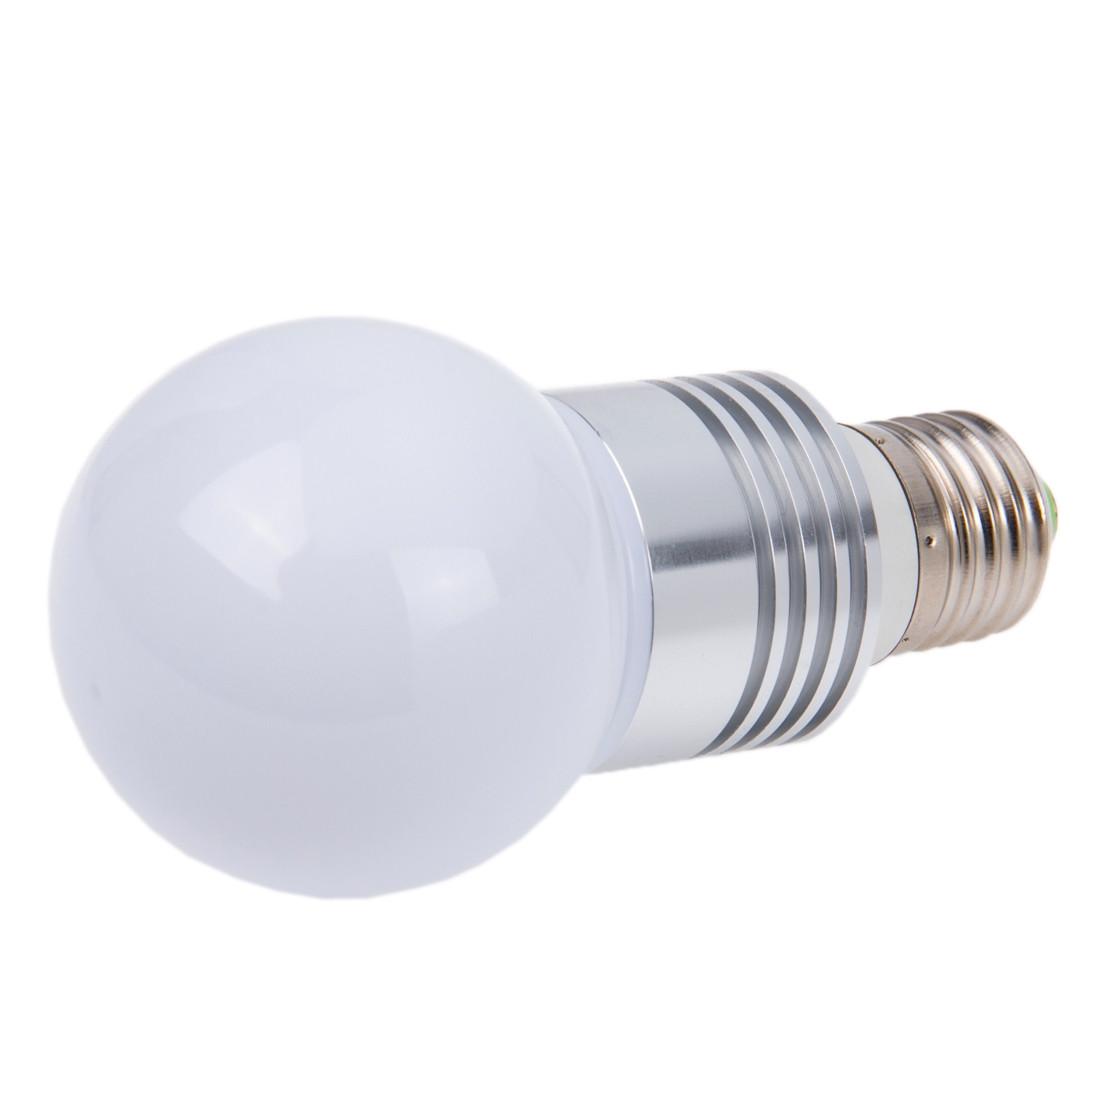 E27 TélécommandeAc RgbAvec Led Lampe 1w 220v R5Lqj34A